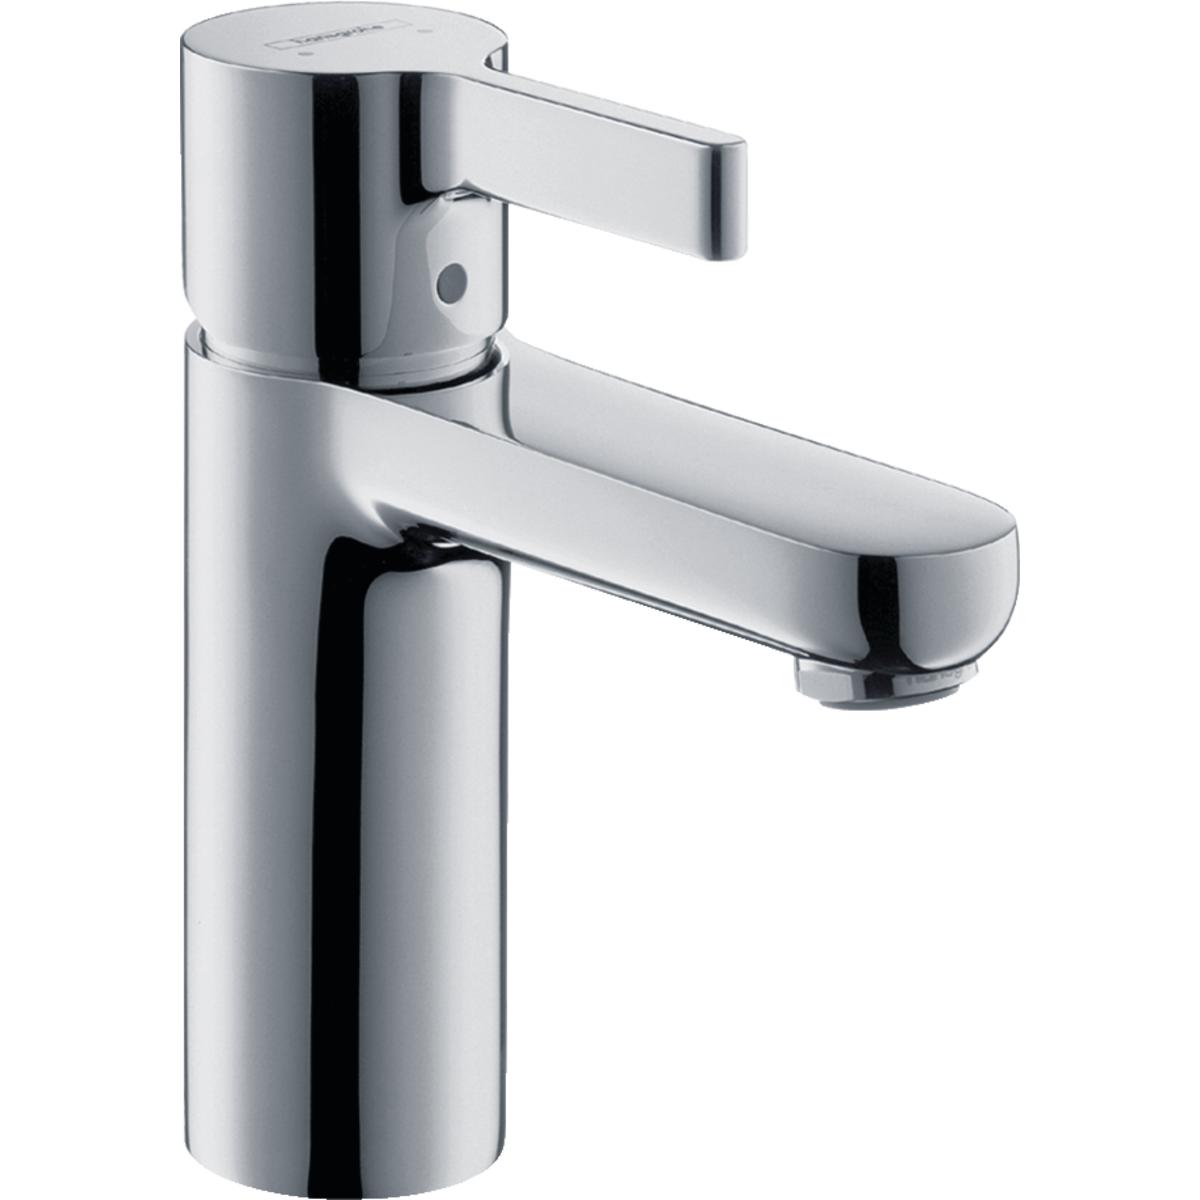 hansgrohe metris s modern 1 handle 6 inch tall bathroom sink faucet in chrome